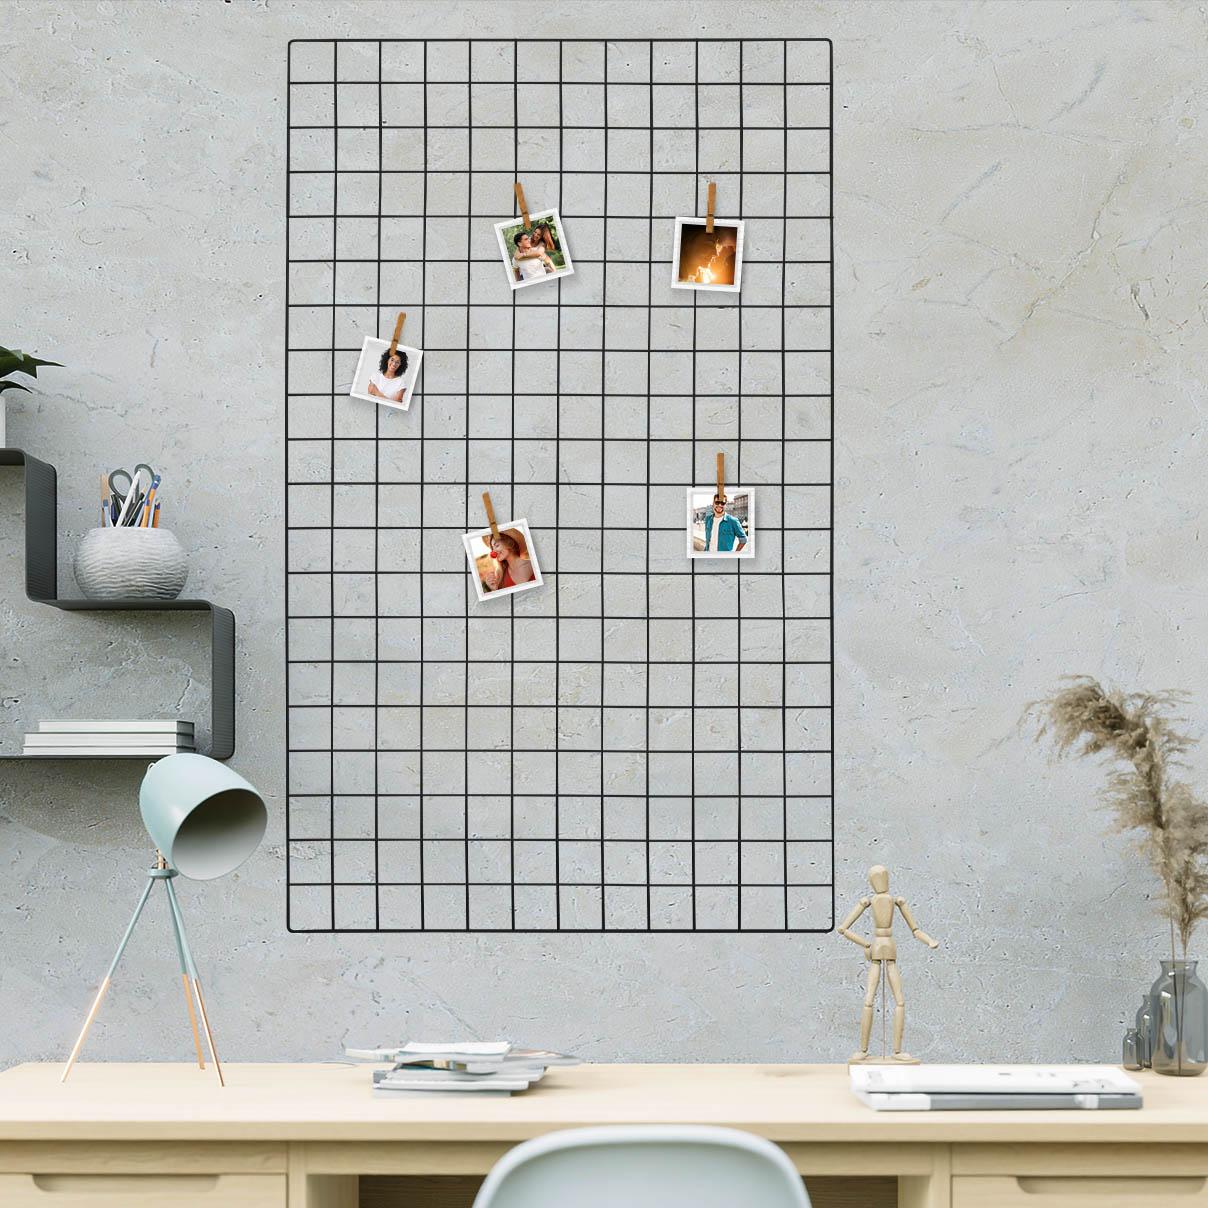 Tela Mural Memory Board 60x100cm - 2 Unidades